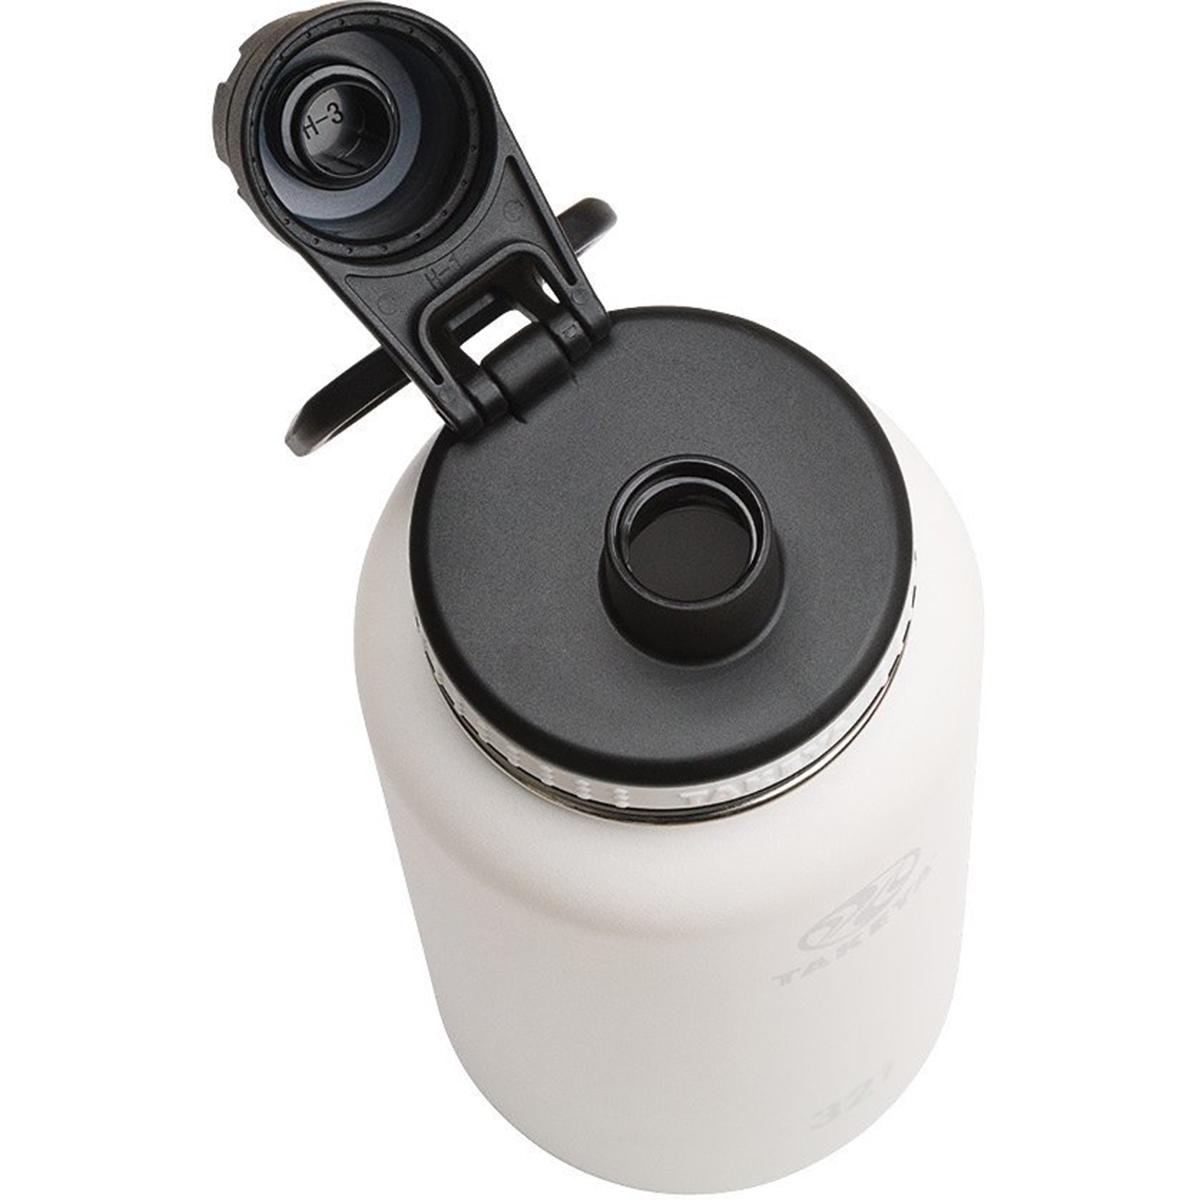 Takeya-Originals-32-oz-Insulated-Stainless-Steel-Water-Bottle thumbnail 21